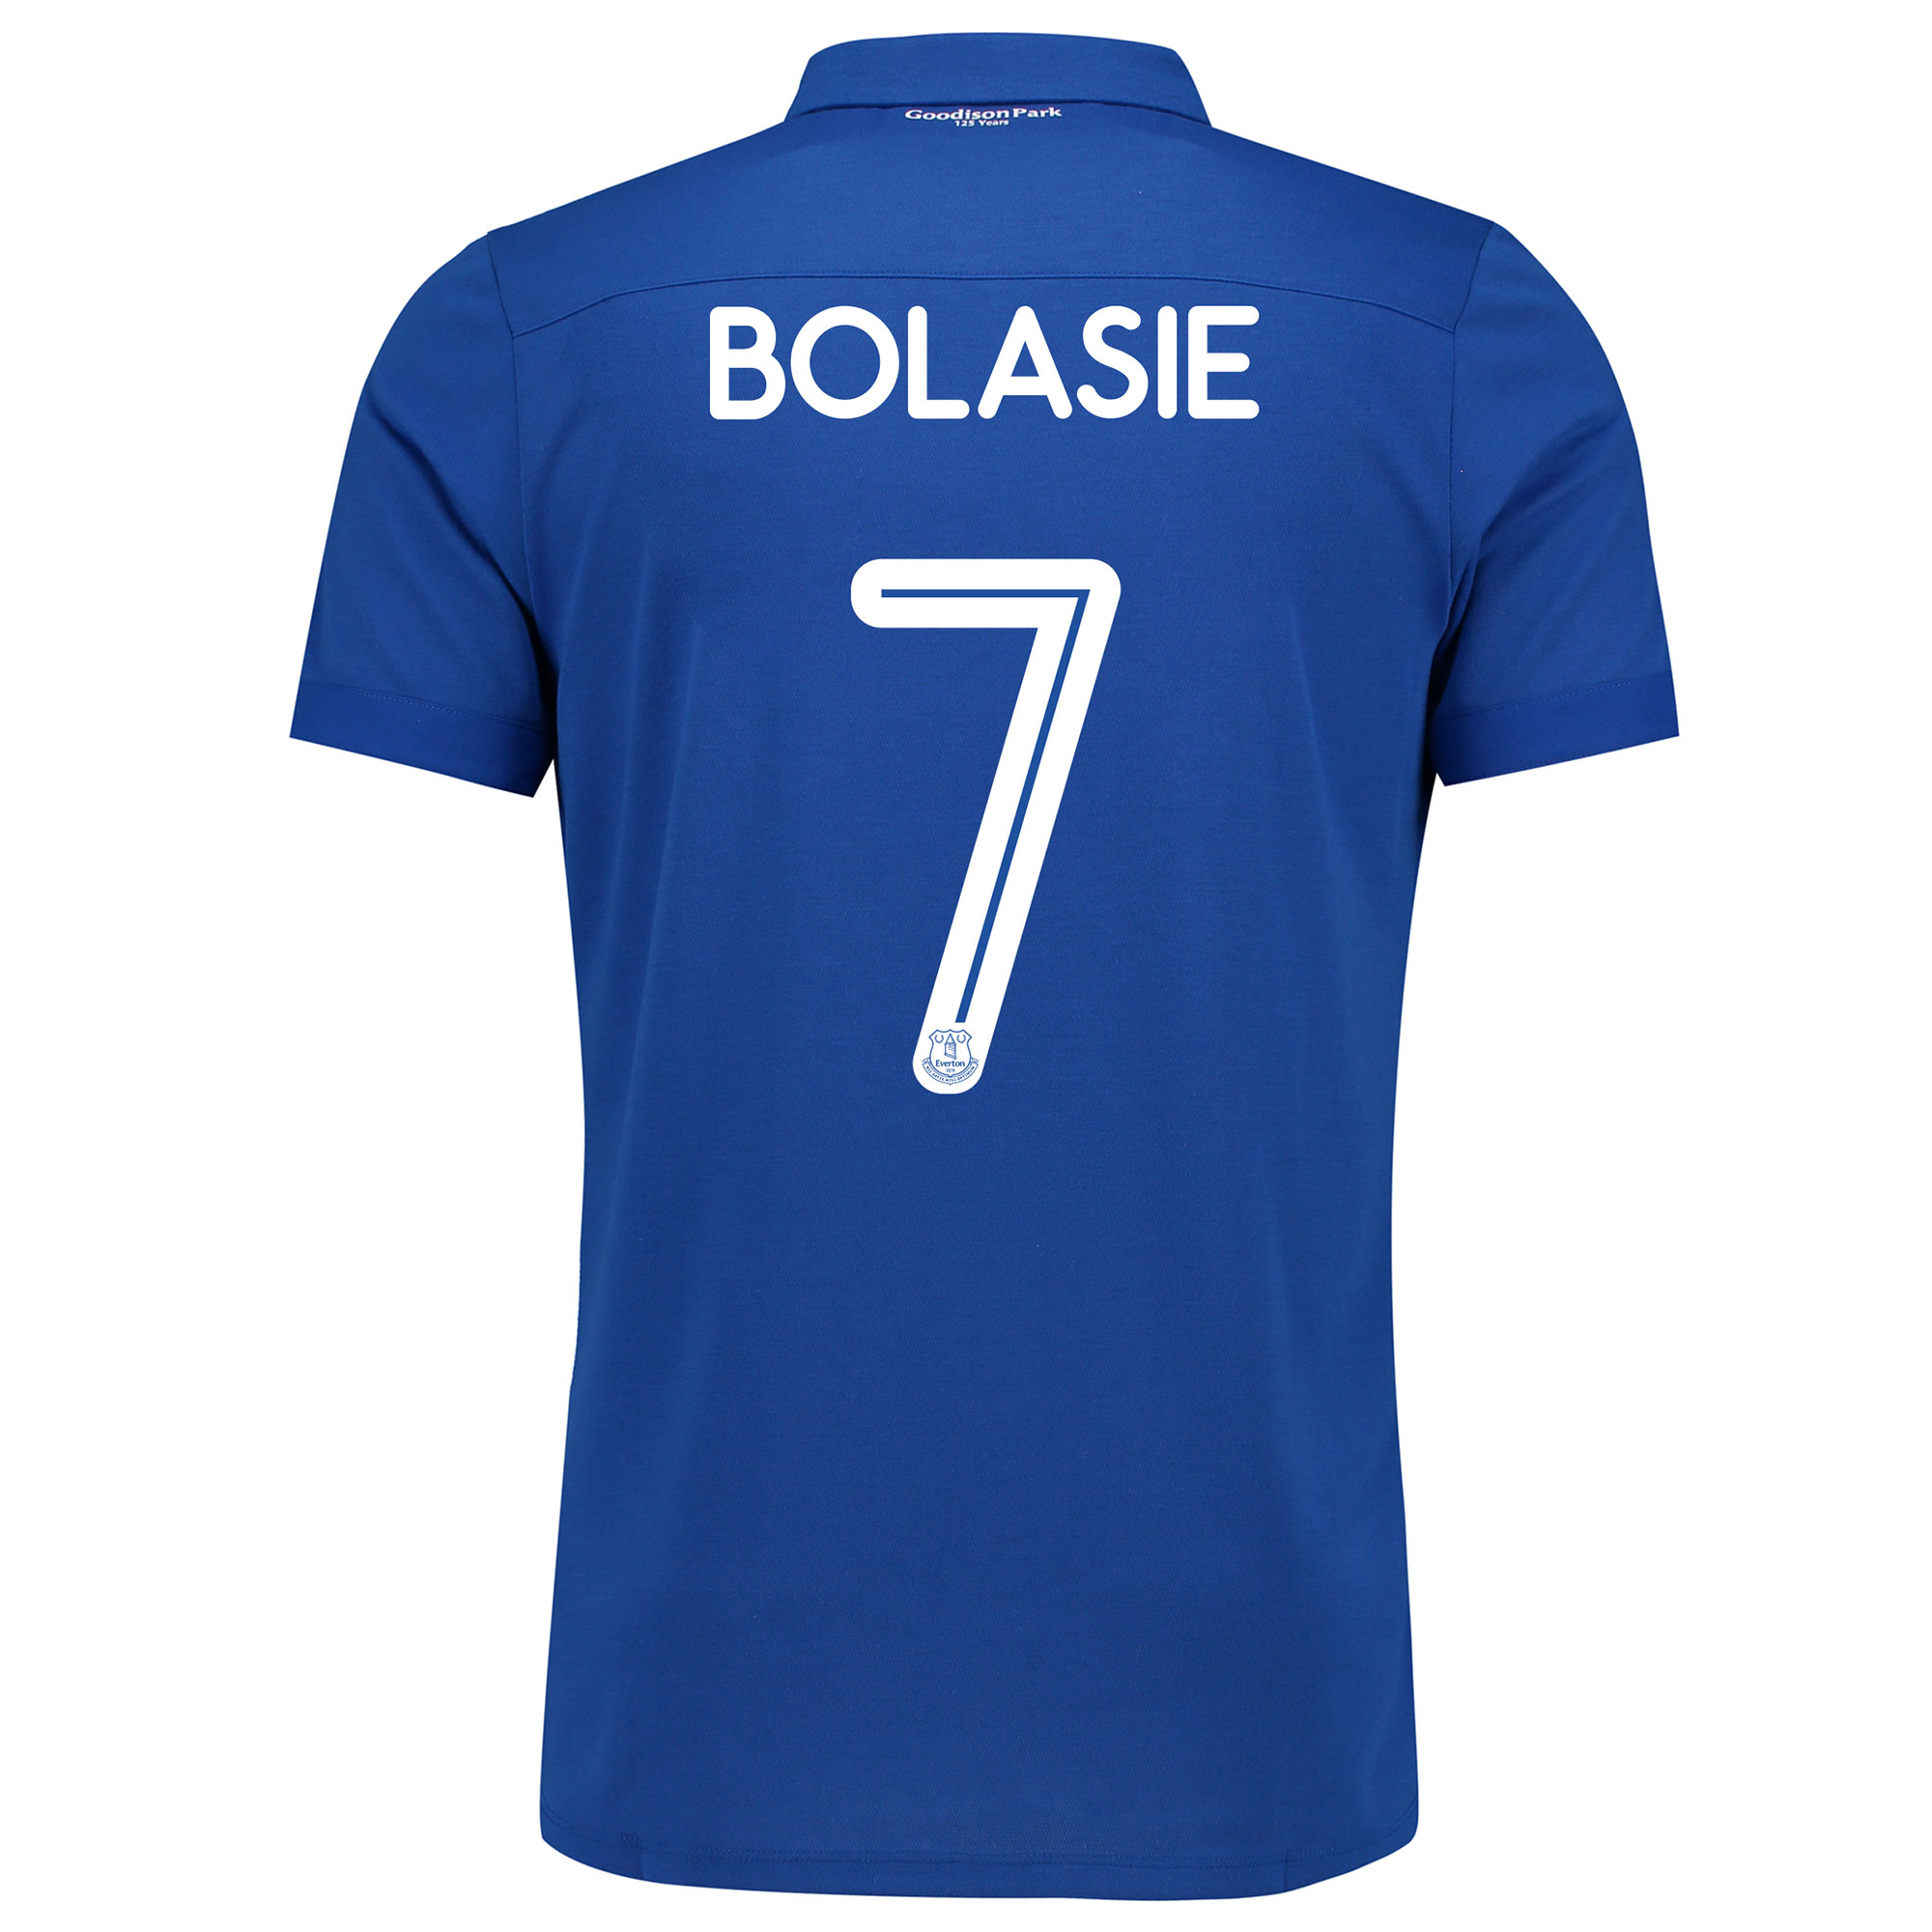 Image of Everton Commemorative Shirt - Junior with Bolasie 7 printing